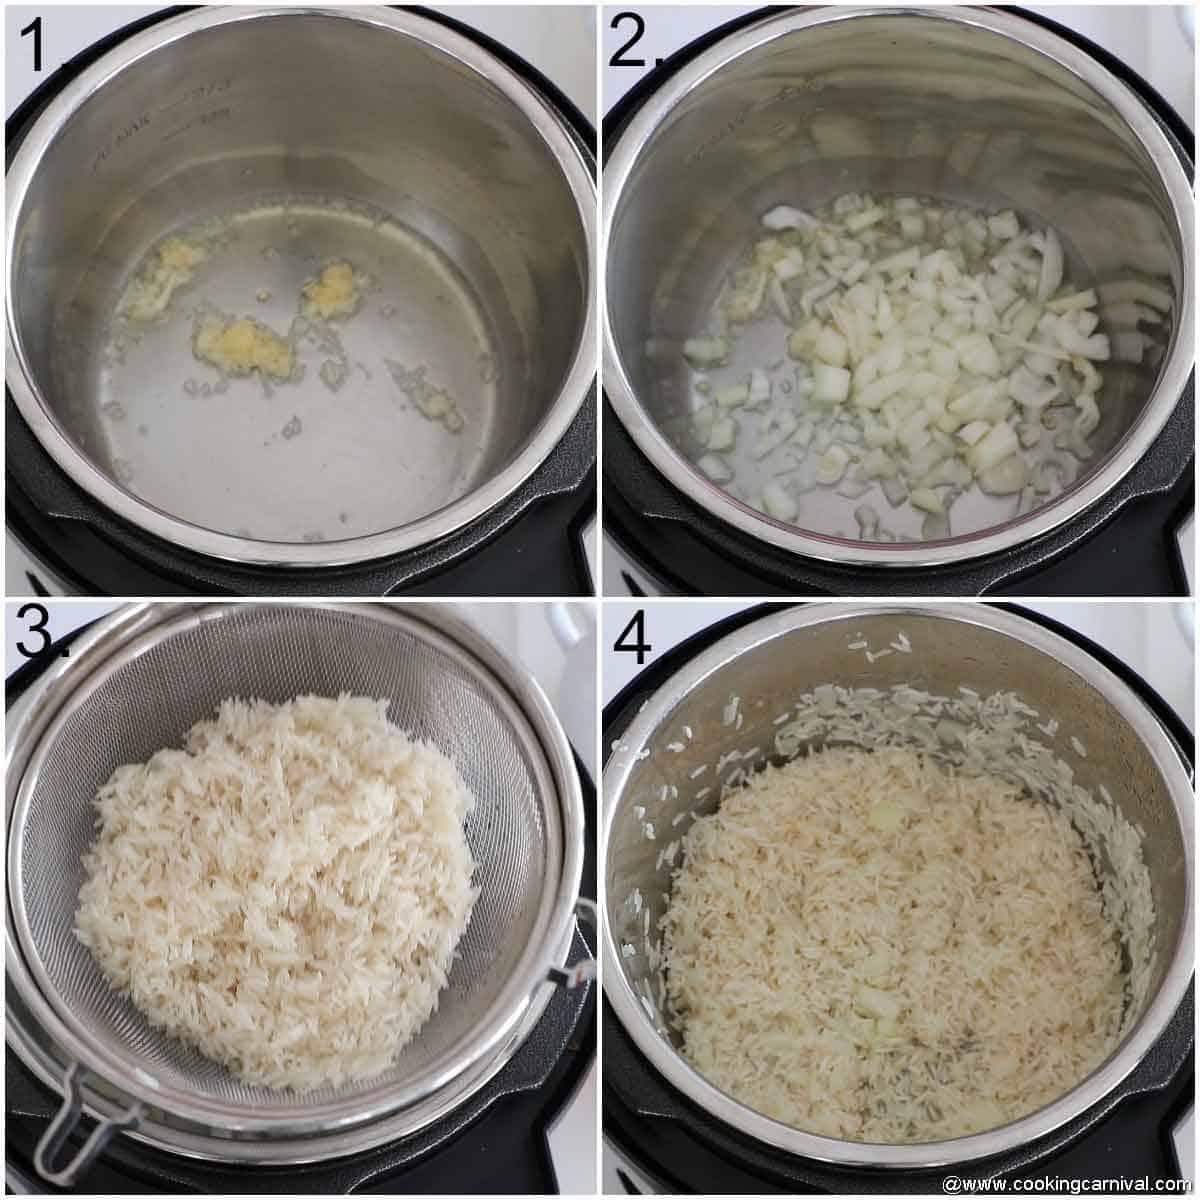 Adding oil, garlic, onion, rice in instant pot